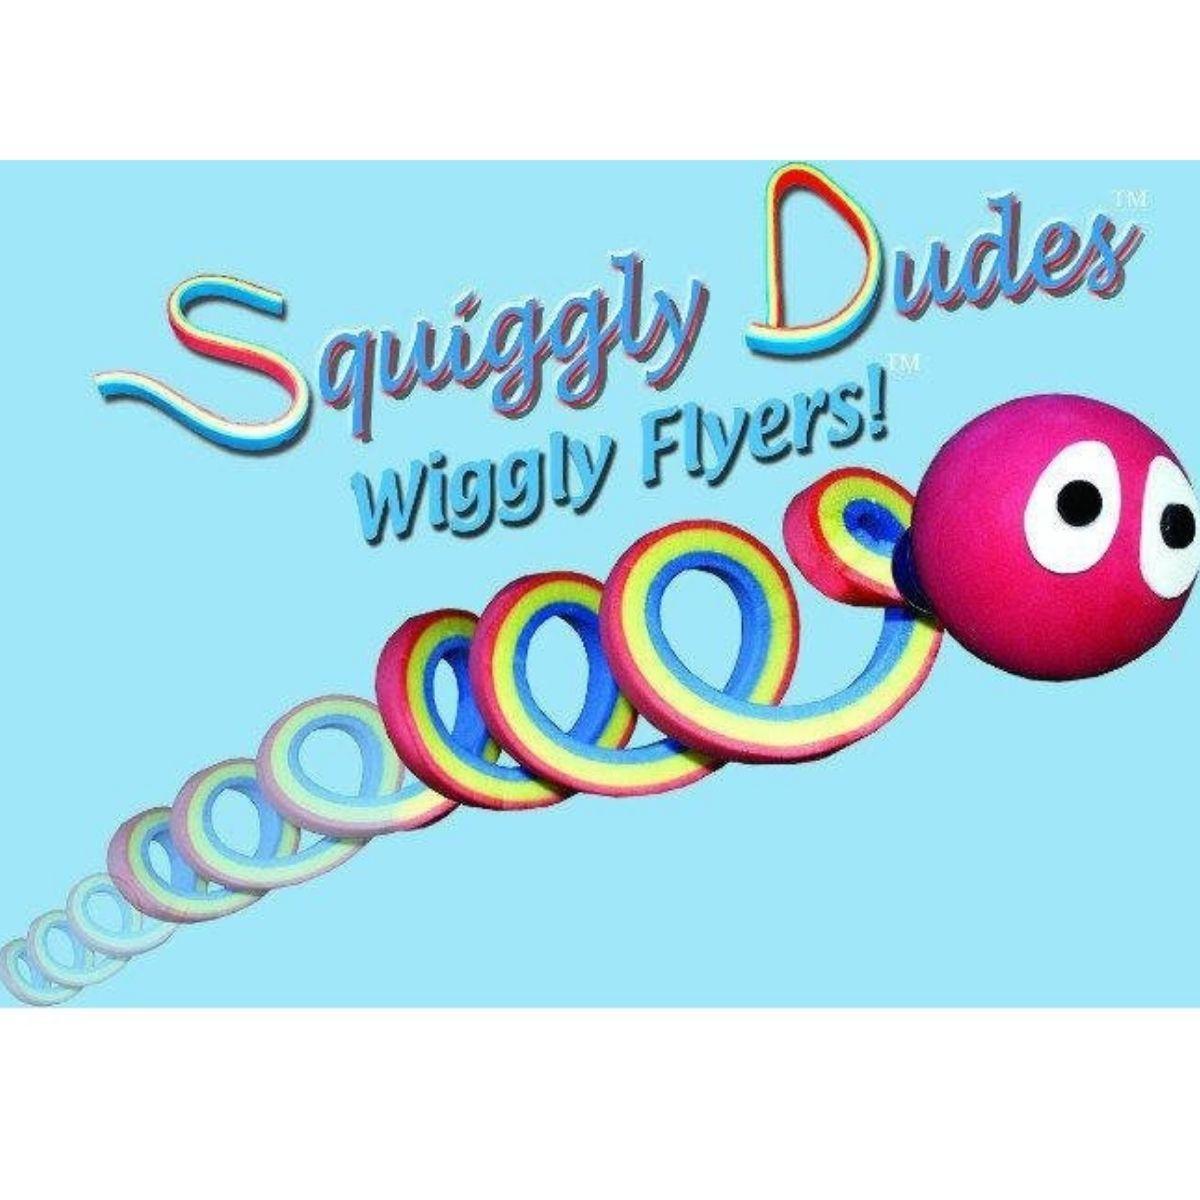 Brinquedo  Squiggly Dudes WIGGLY FLUERS